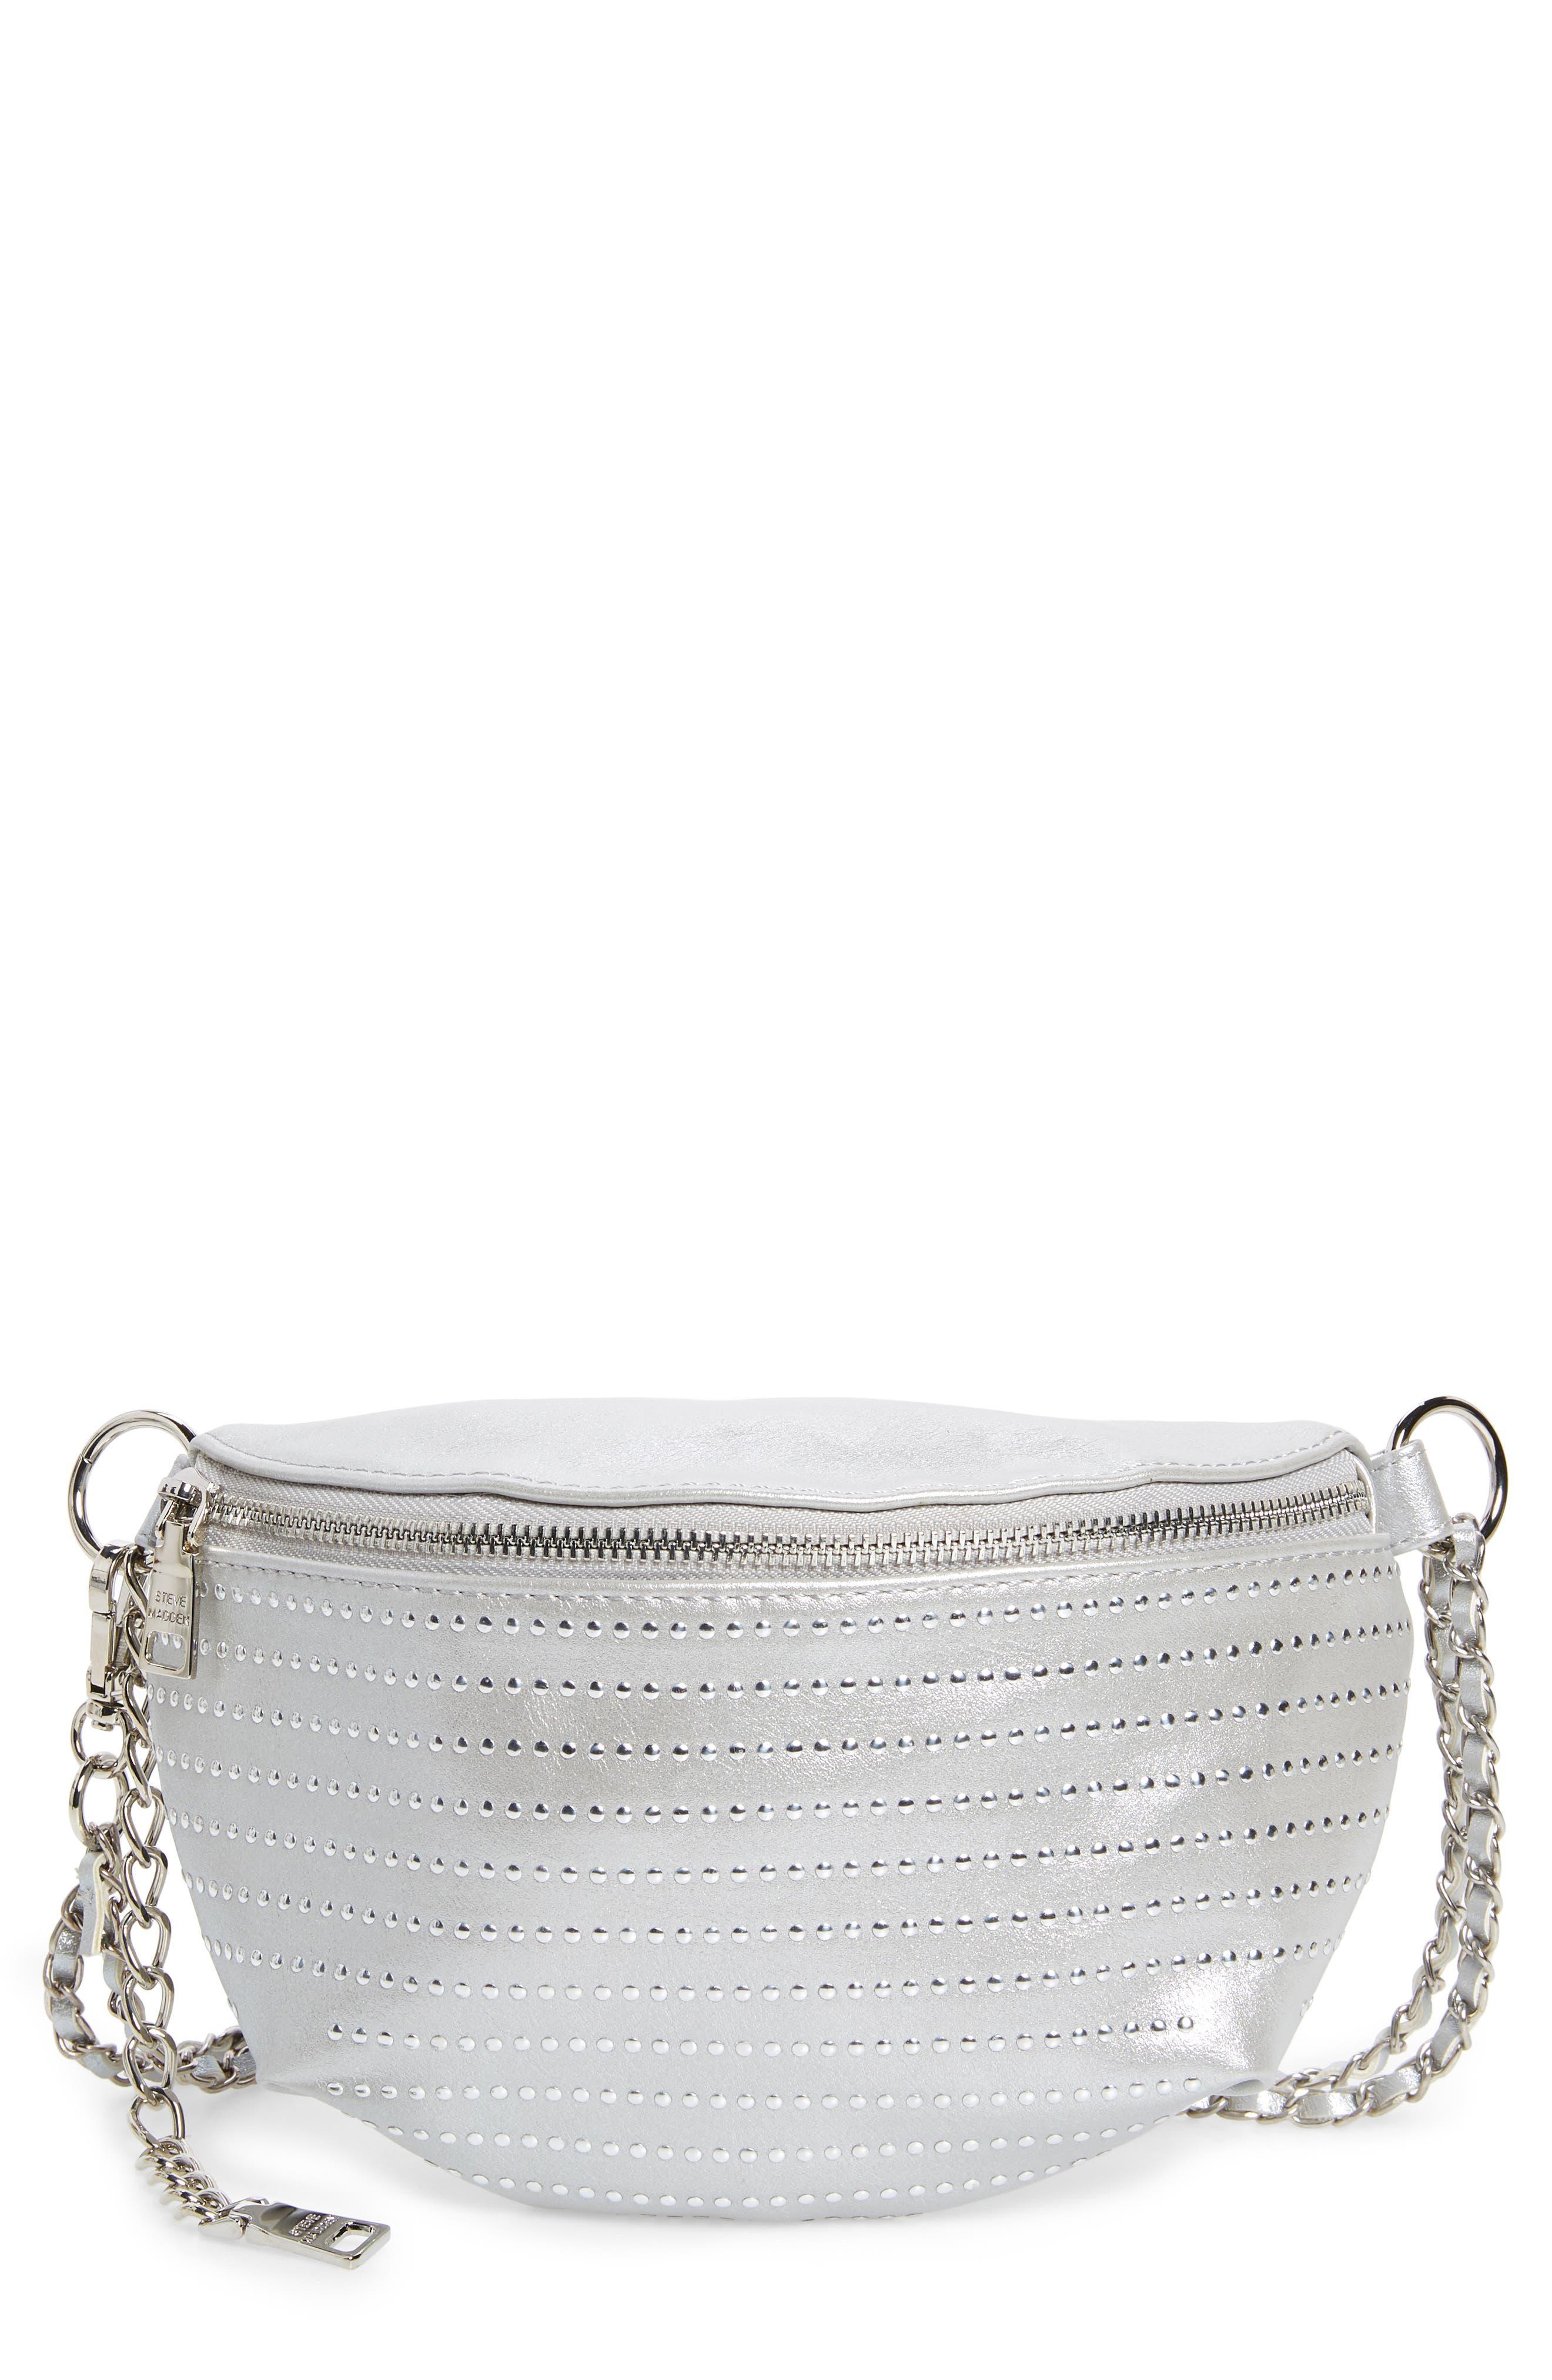 Becca Metallic Studded Belt Bag,                             Main thumbnail 1, color,                             SILVER